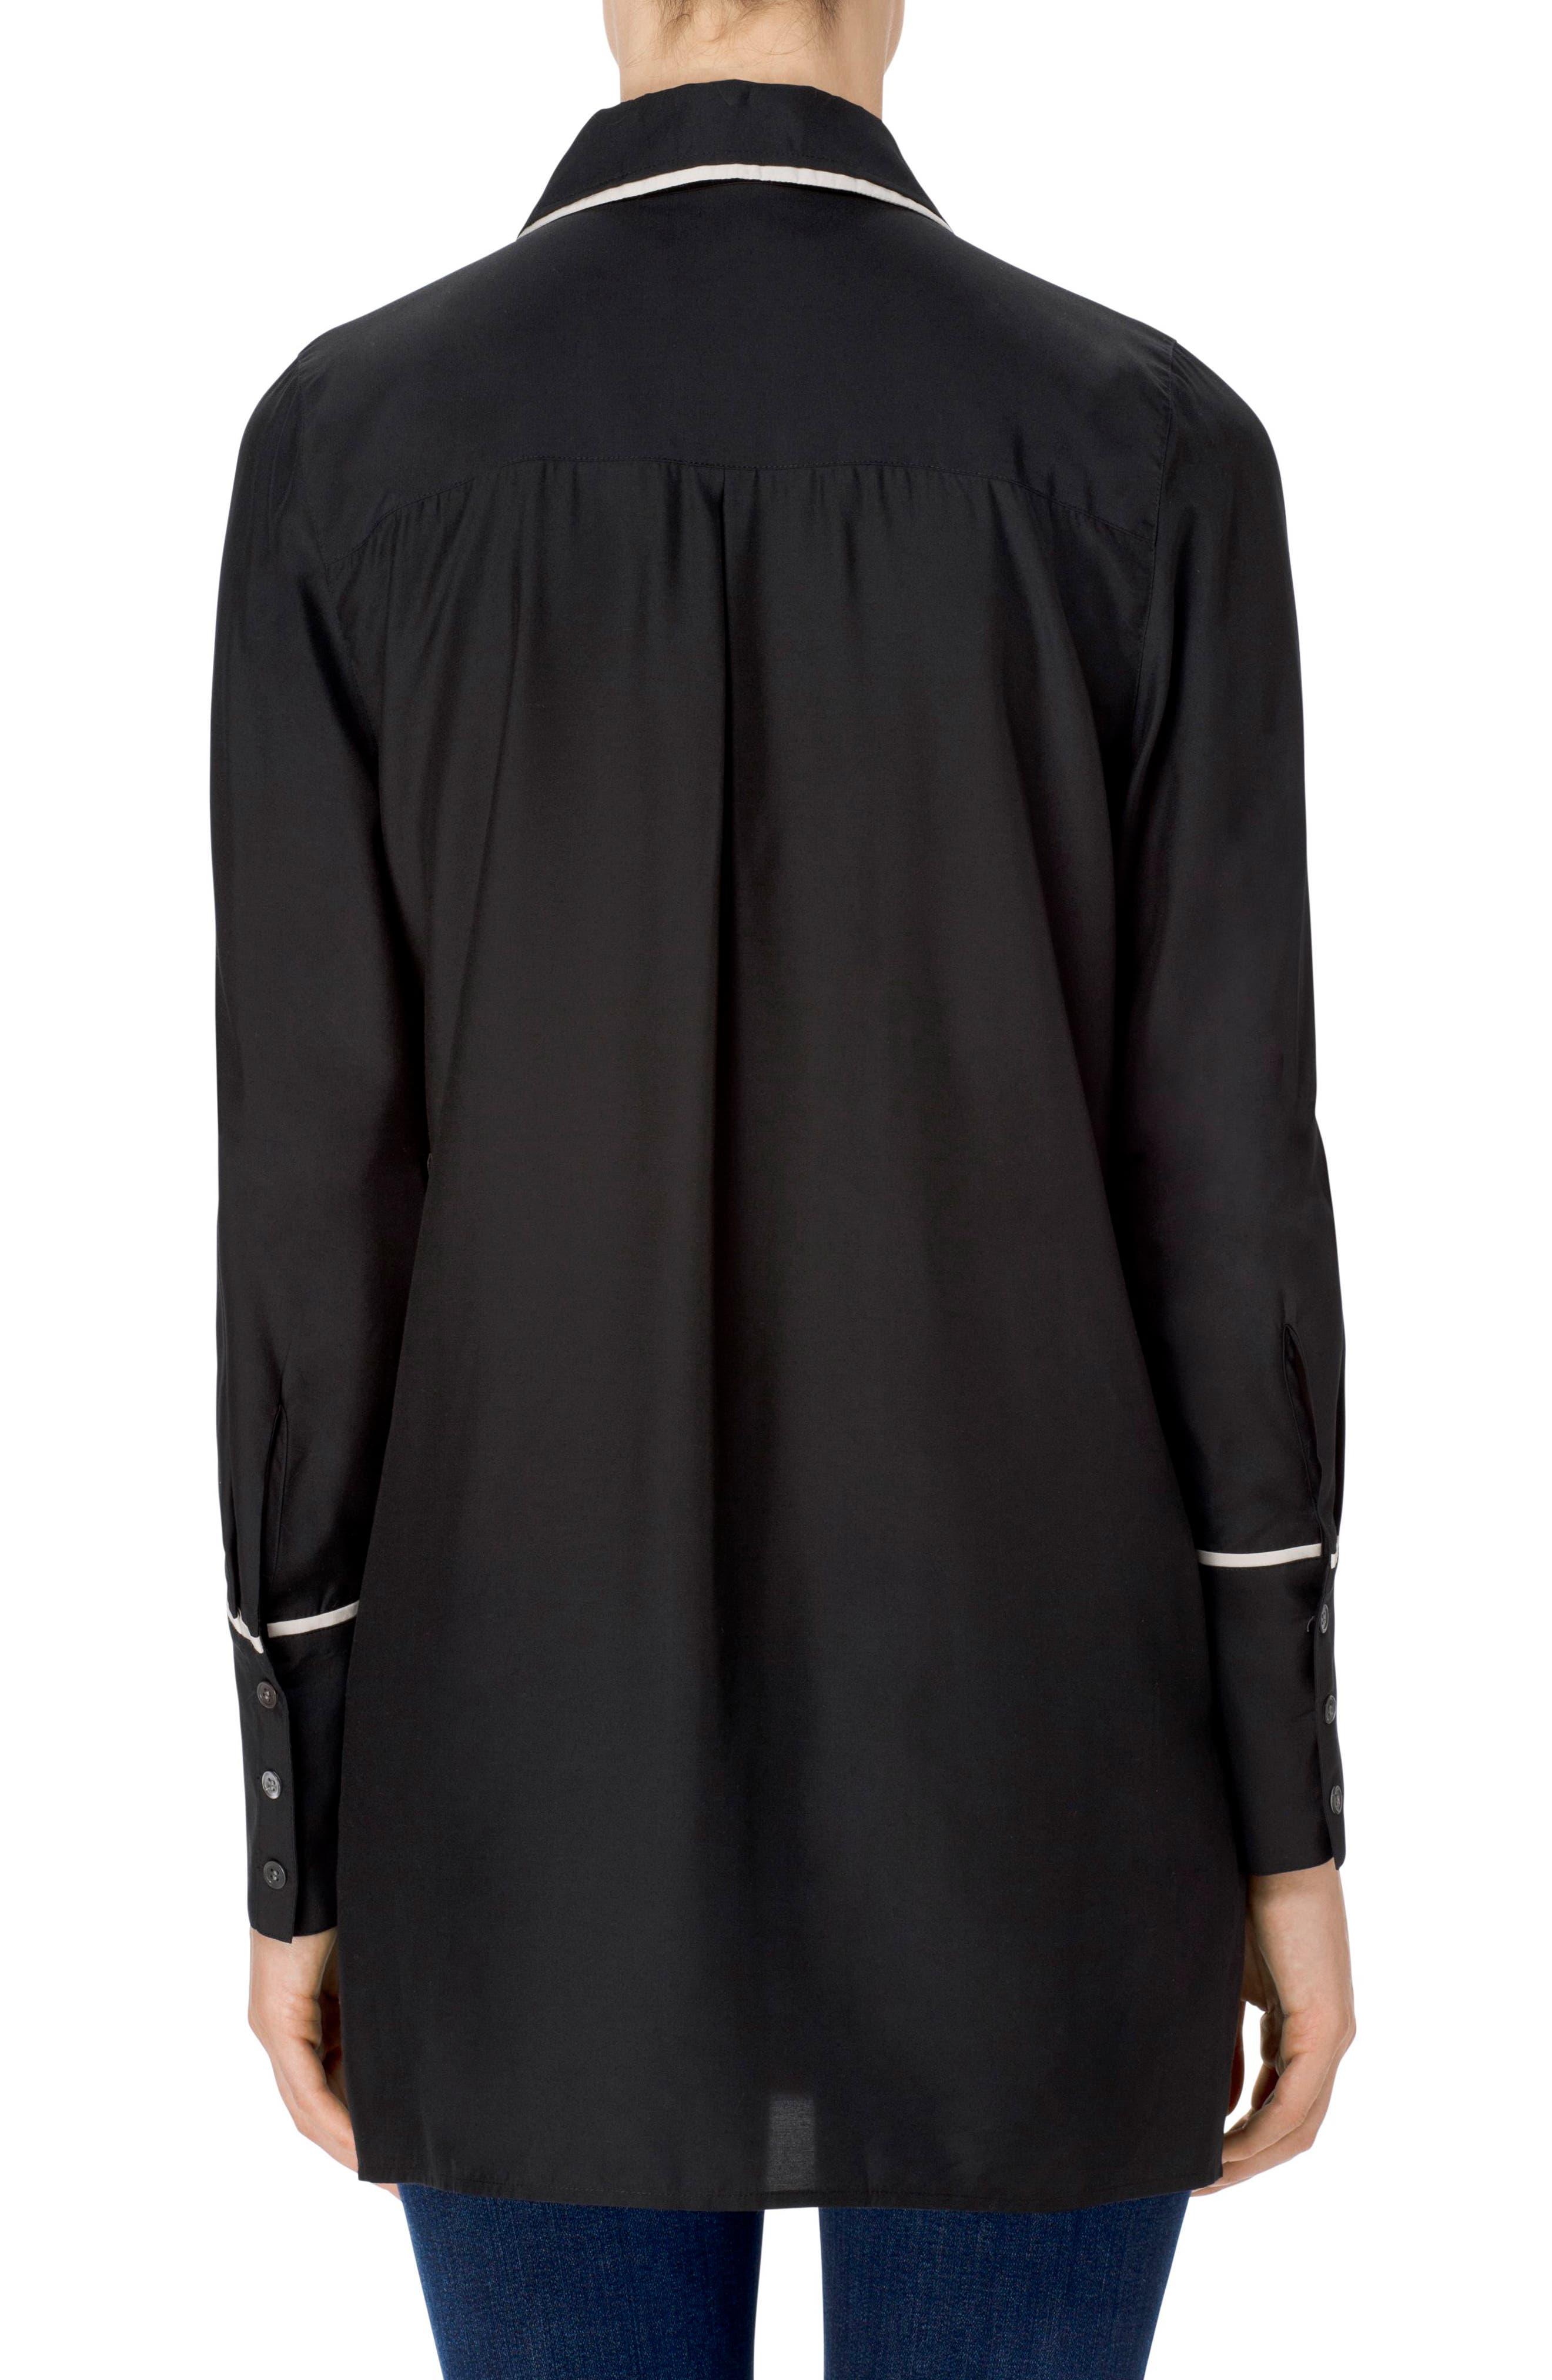 Blake Oversize Shirt,                             Alternate thumbnail 2, color,                             001